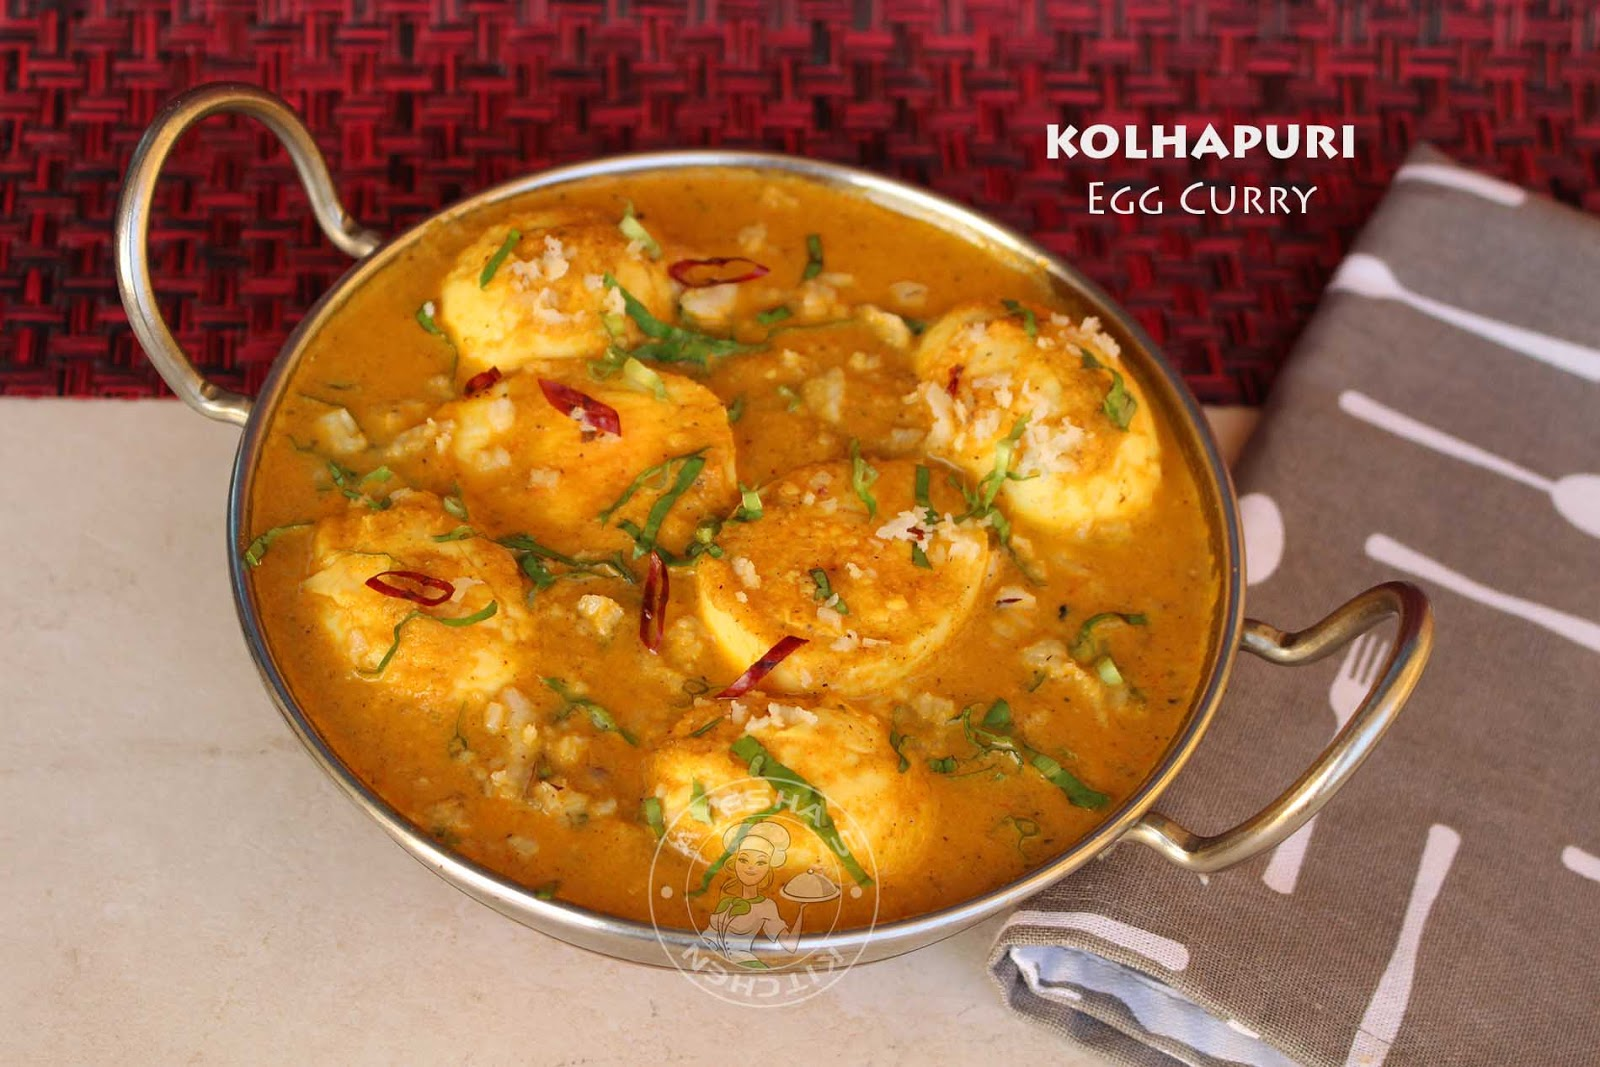 Simple egg recipes kolhapuri egg curry ayesha farah ayeshas kitchen recipes egg recipes curryworld tasty egg curry simple easy indian kerala style forumfinder Images